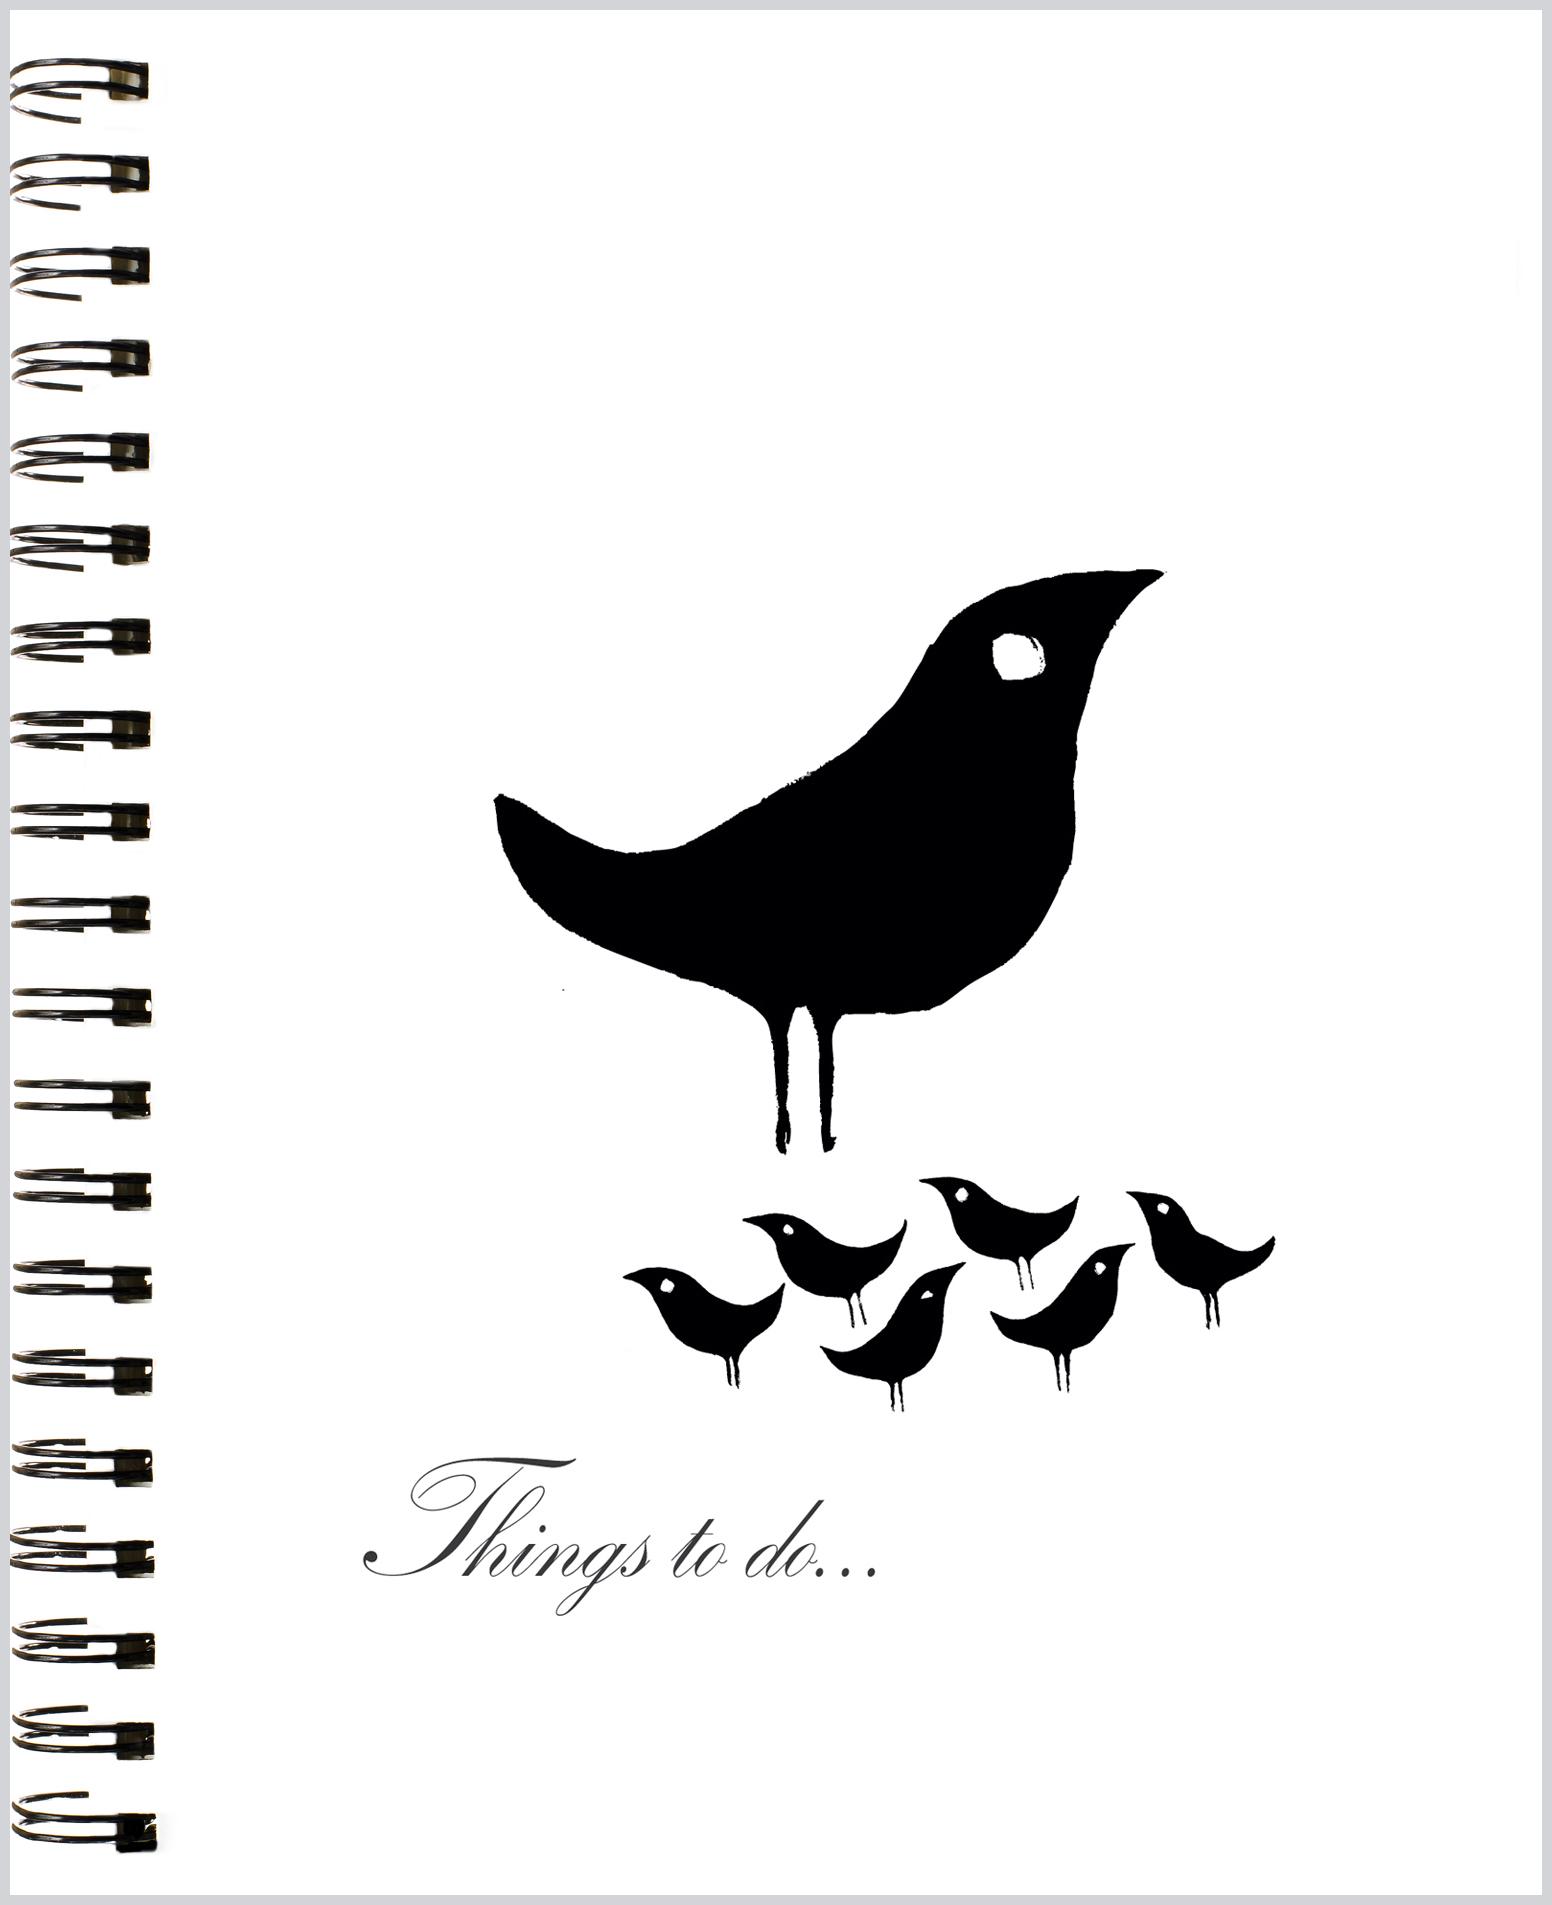 LittleNoteCard_BlackBirdies_Blank Journal